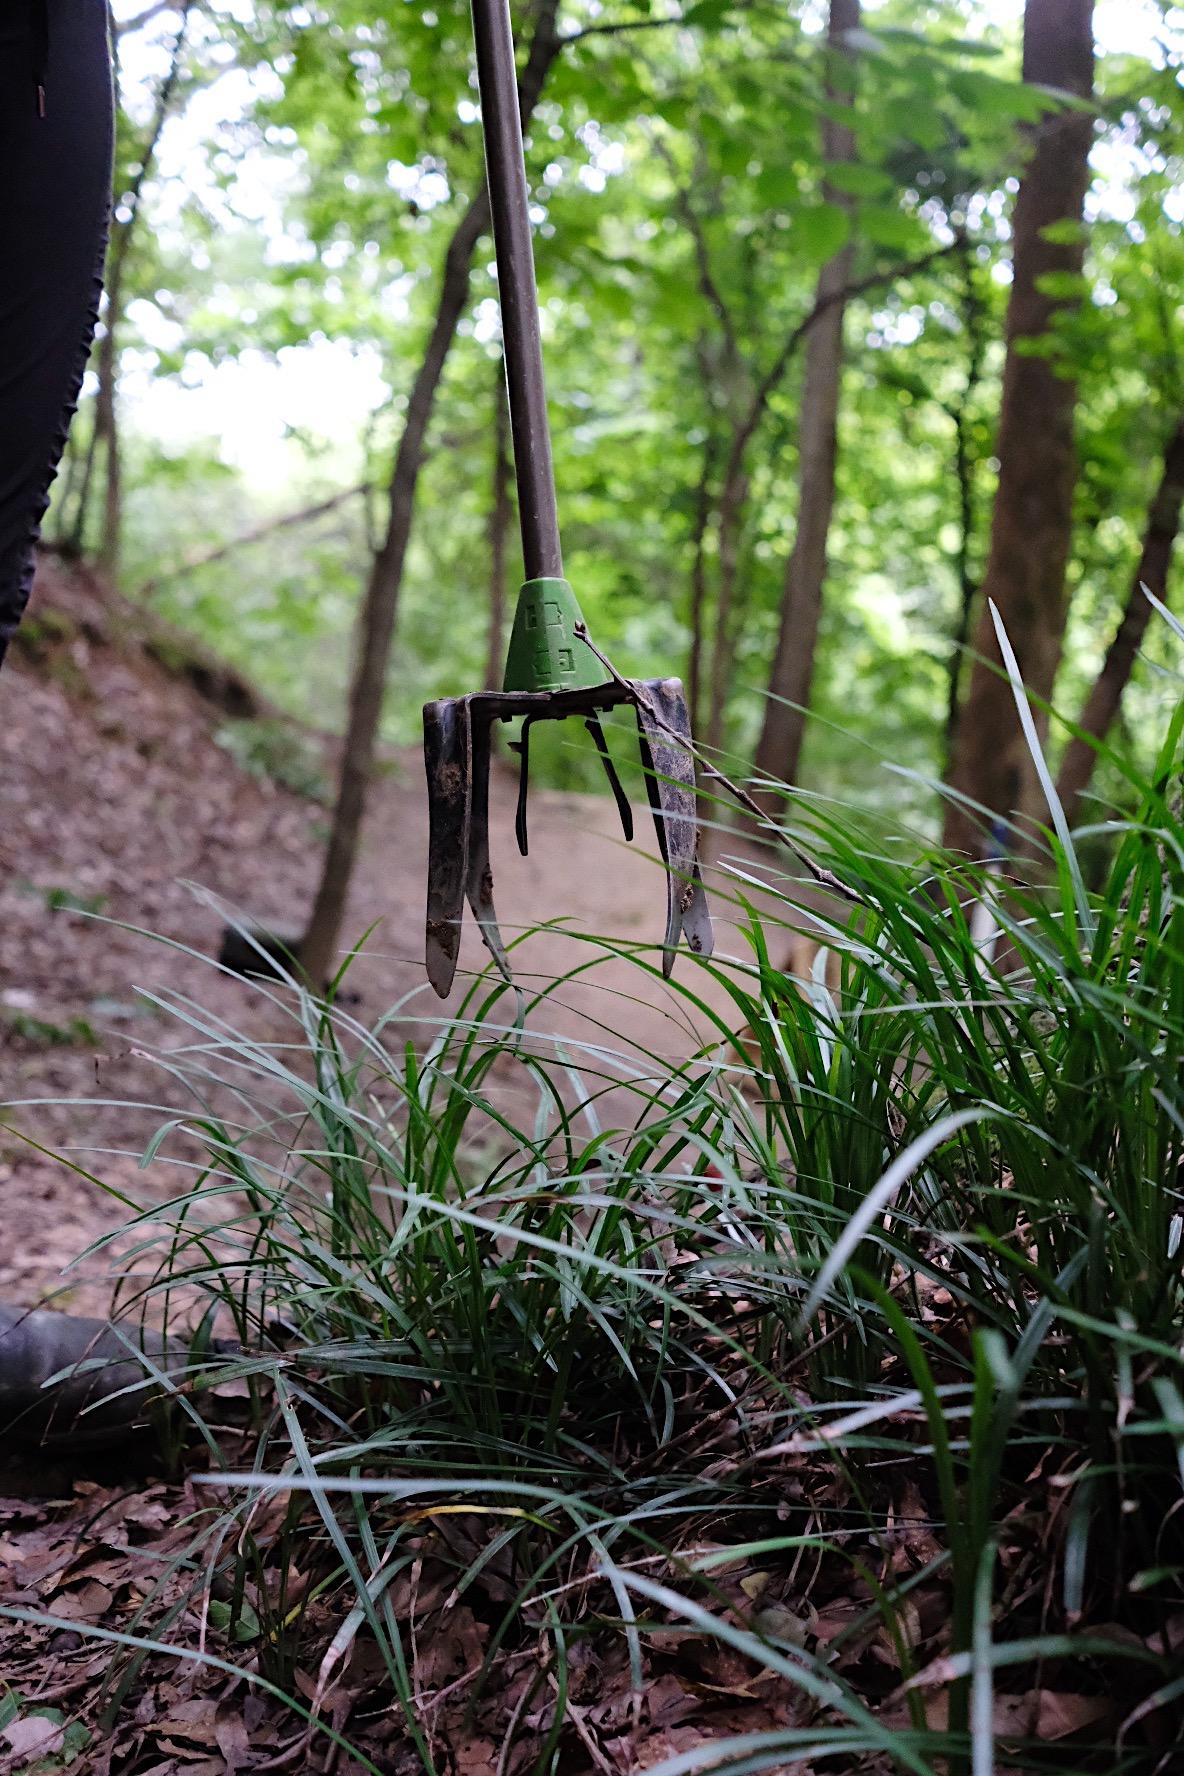 Digging up mondo grass